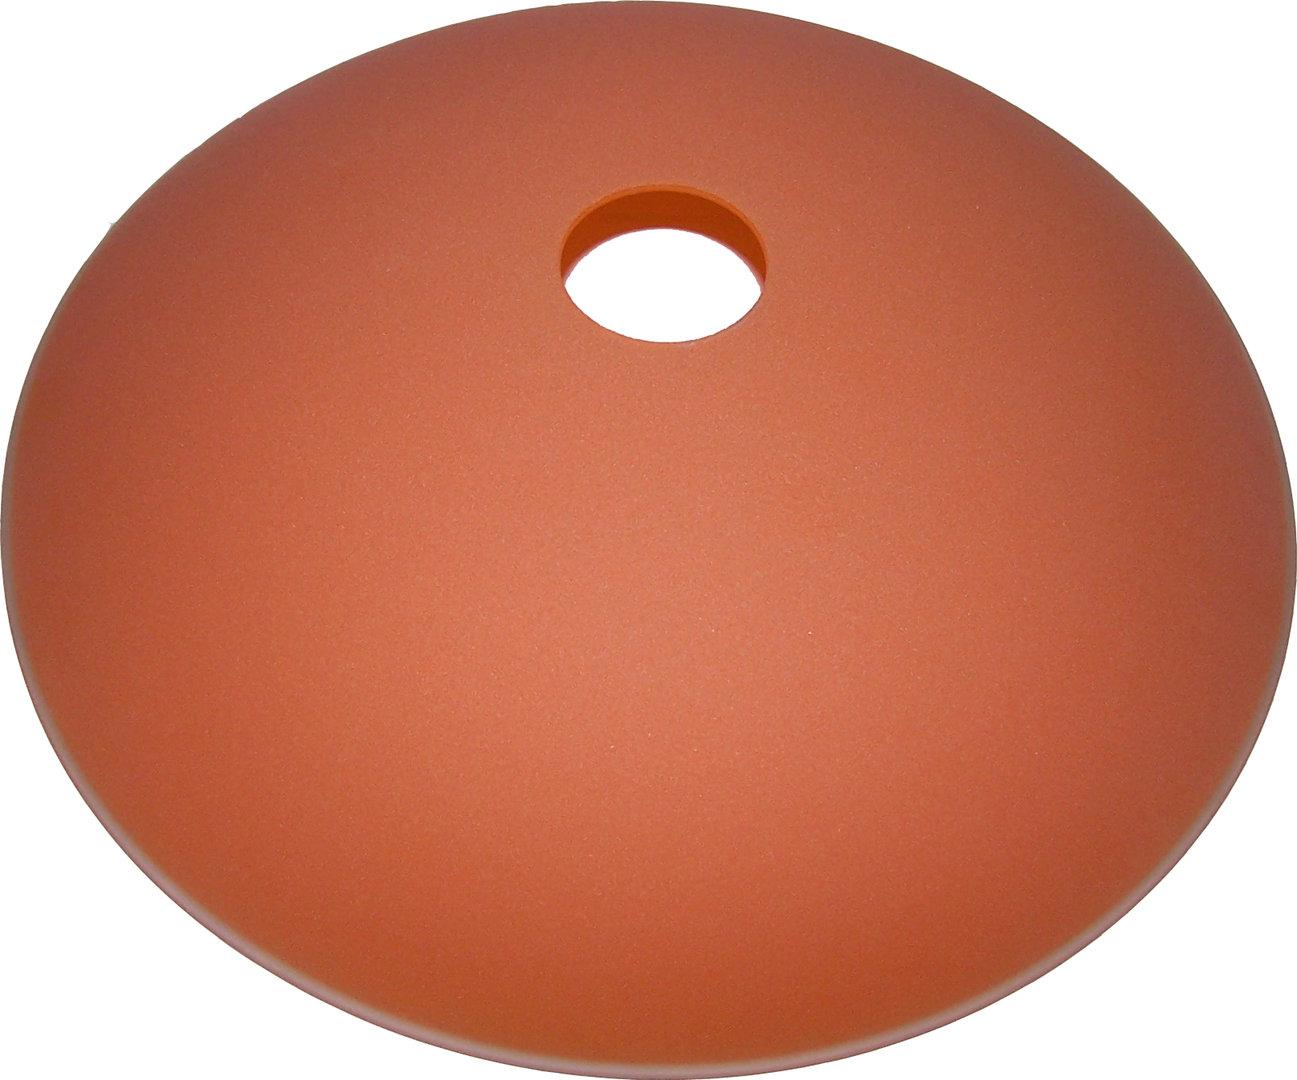 lampenschirm aus glas f r e 27 durchmesser 32 cm cupola range. Black Bedroom Furniture Sets. Home Design Ideas